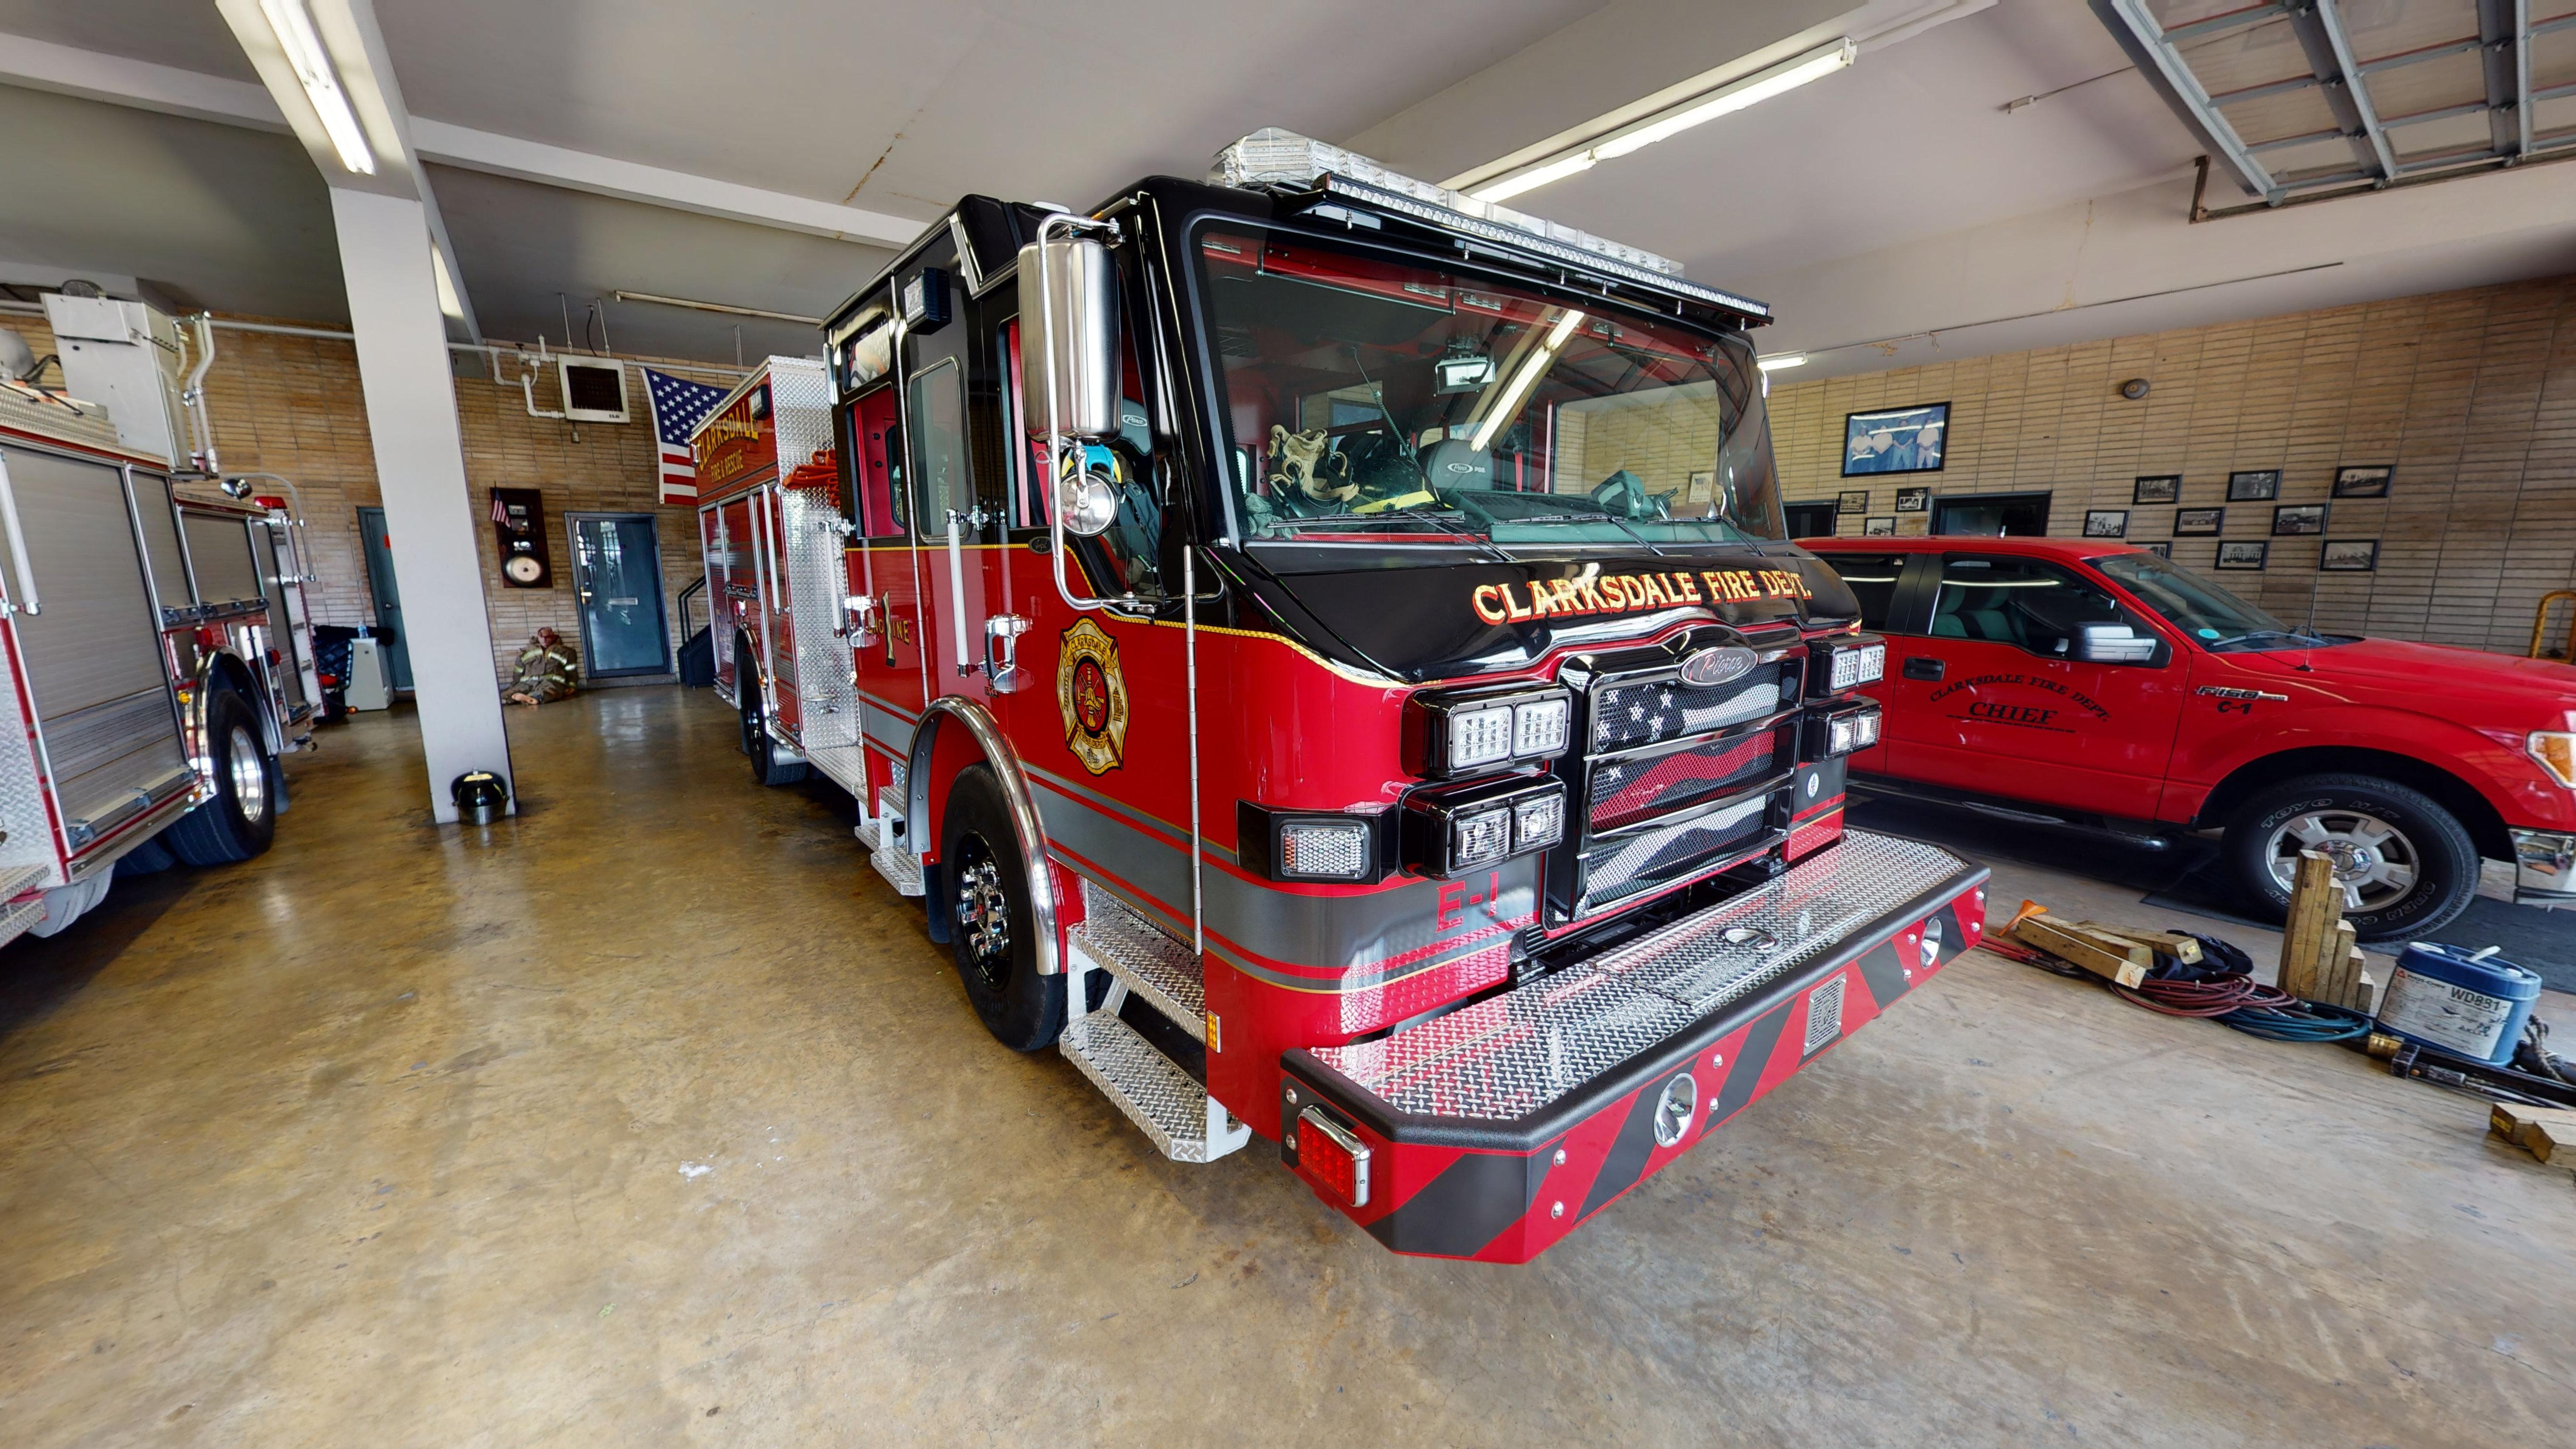 4_Clarksdale-Fire-Dept-06072021_133615